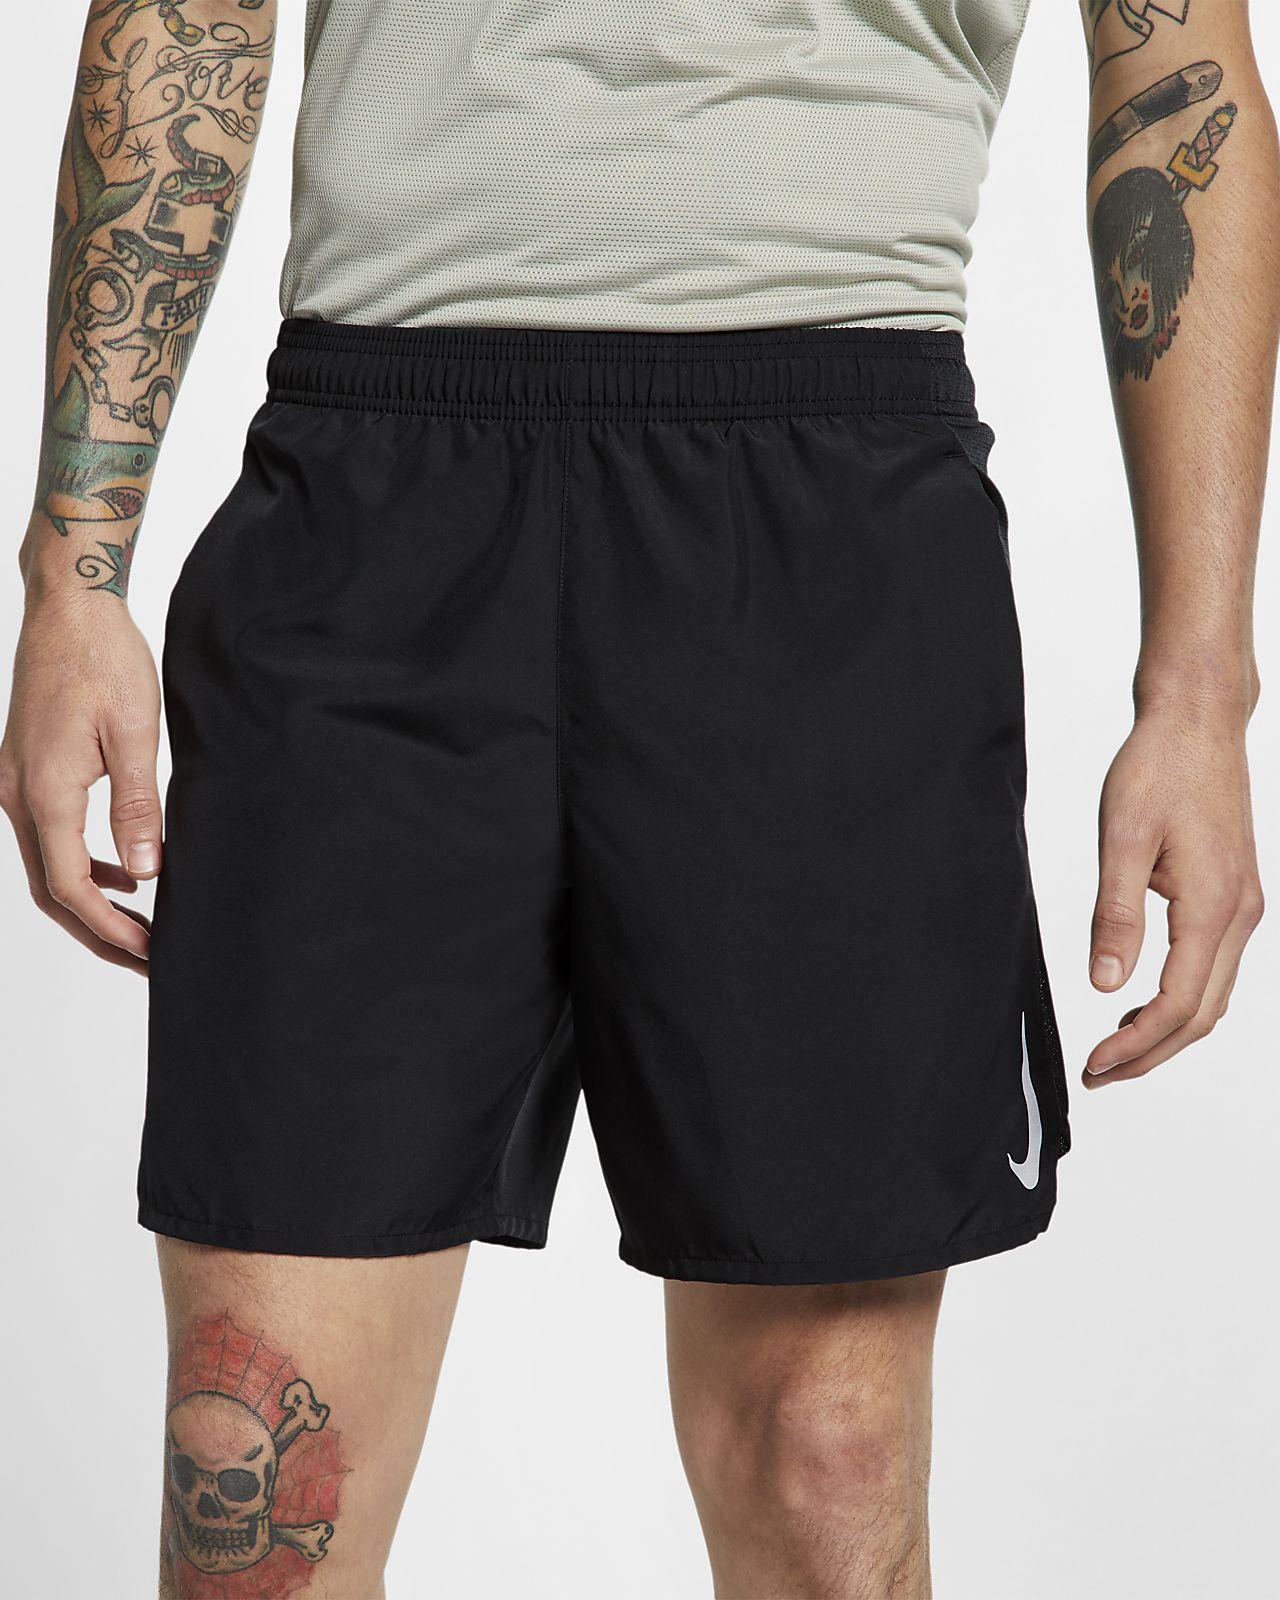 Nike Challenger Men's Unlined Running Shorts